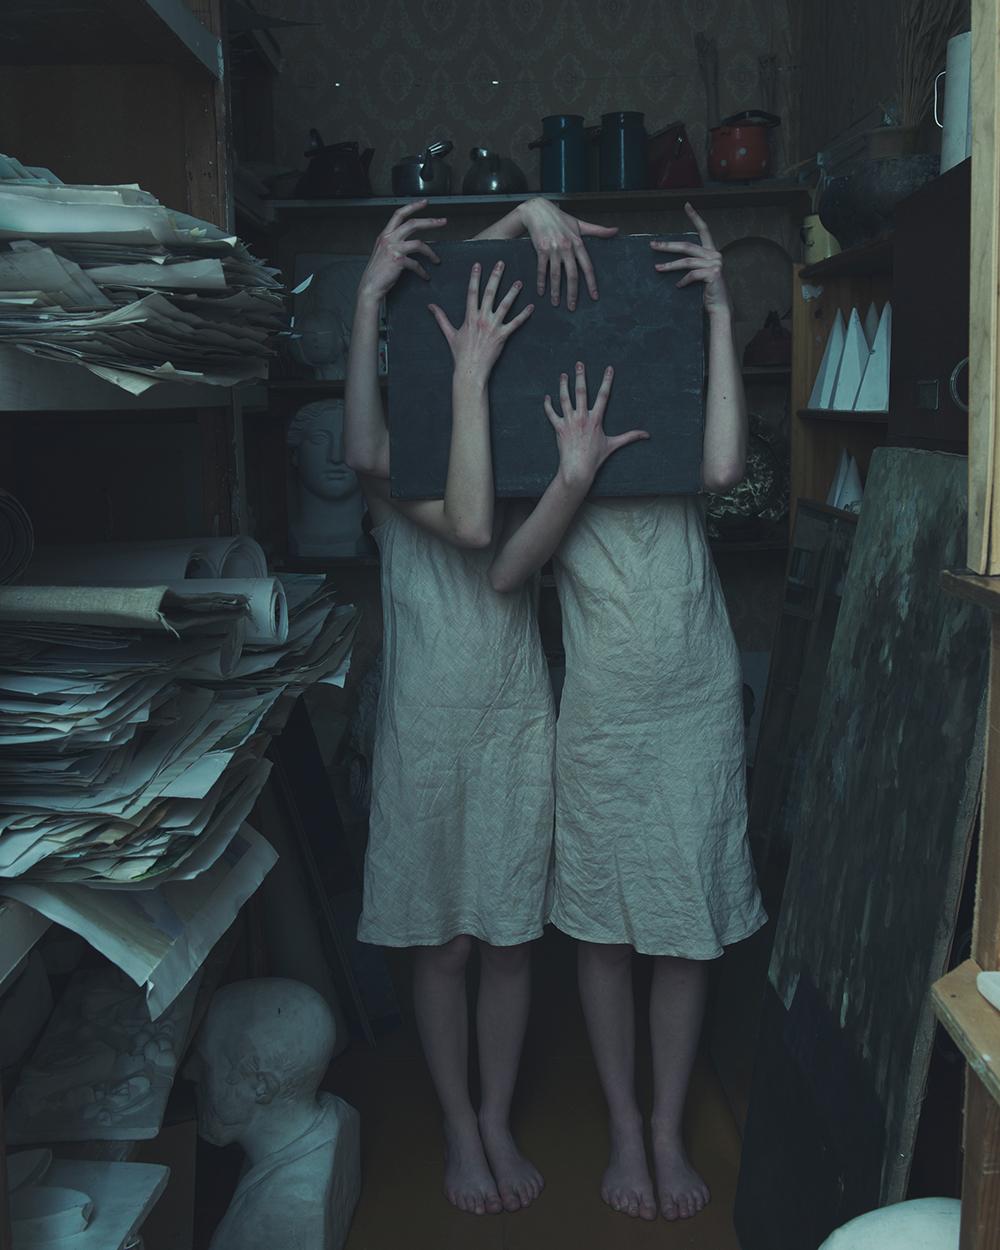 Twins_1_agb.jpg